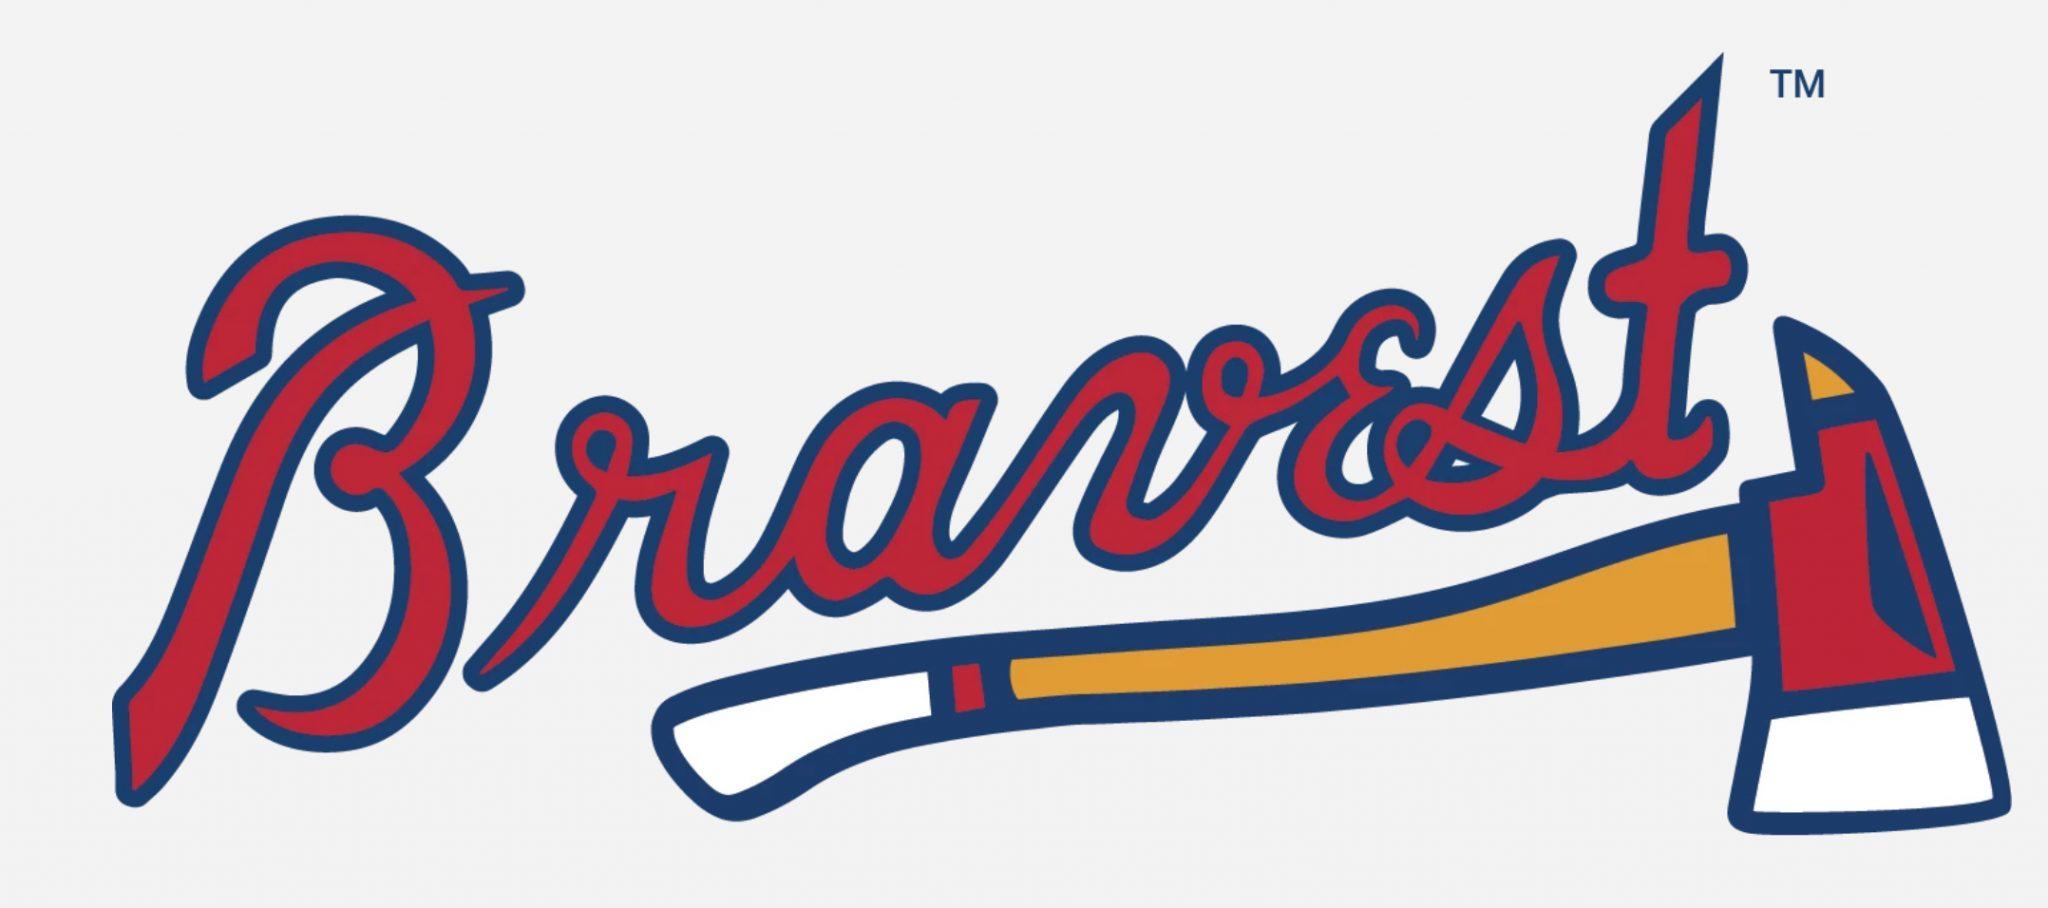 bravest atl large logo